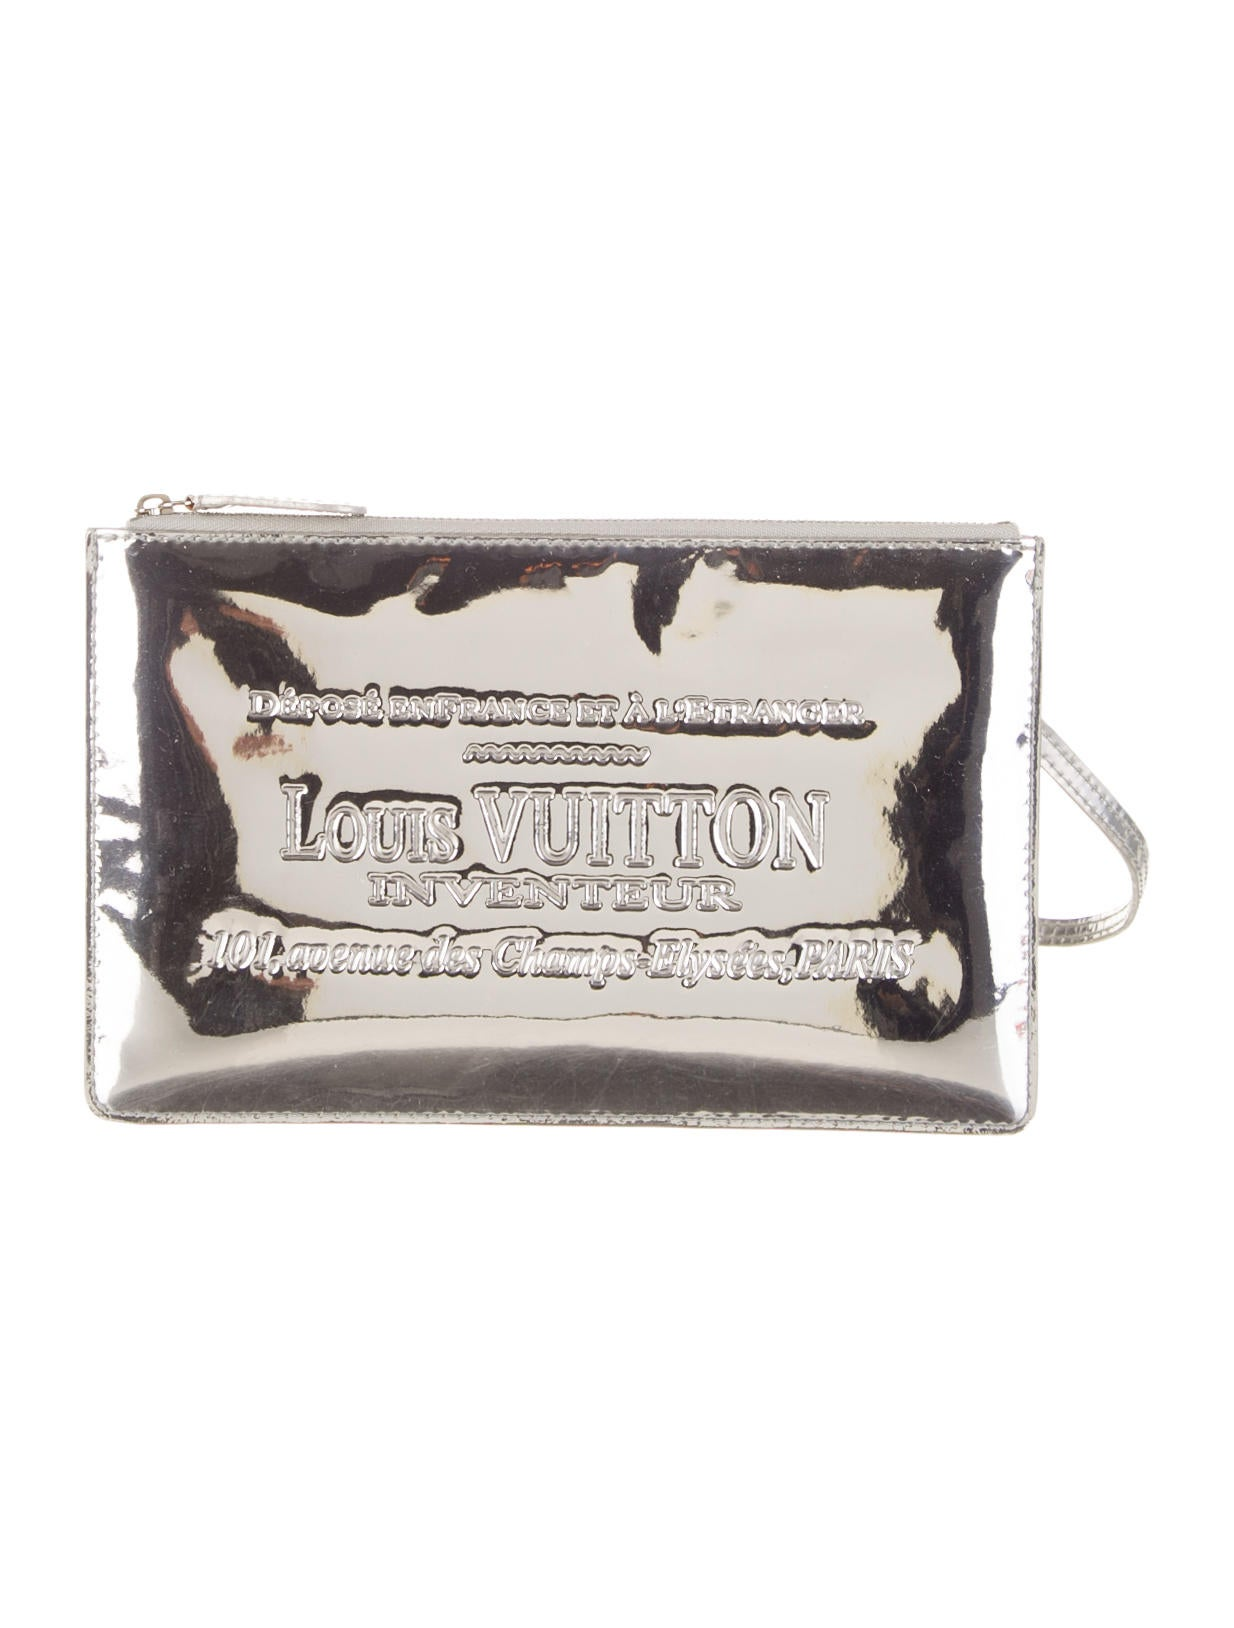 Louis vuitton miroir clutch handbags lou42358 the for Louis vuitton miroir collection